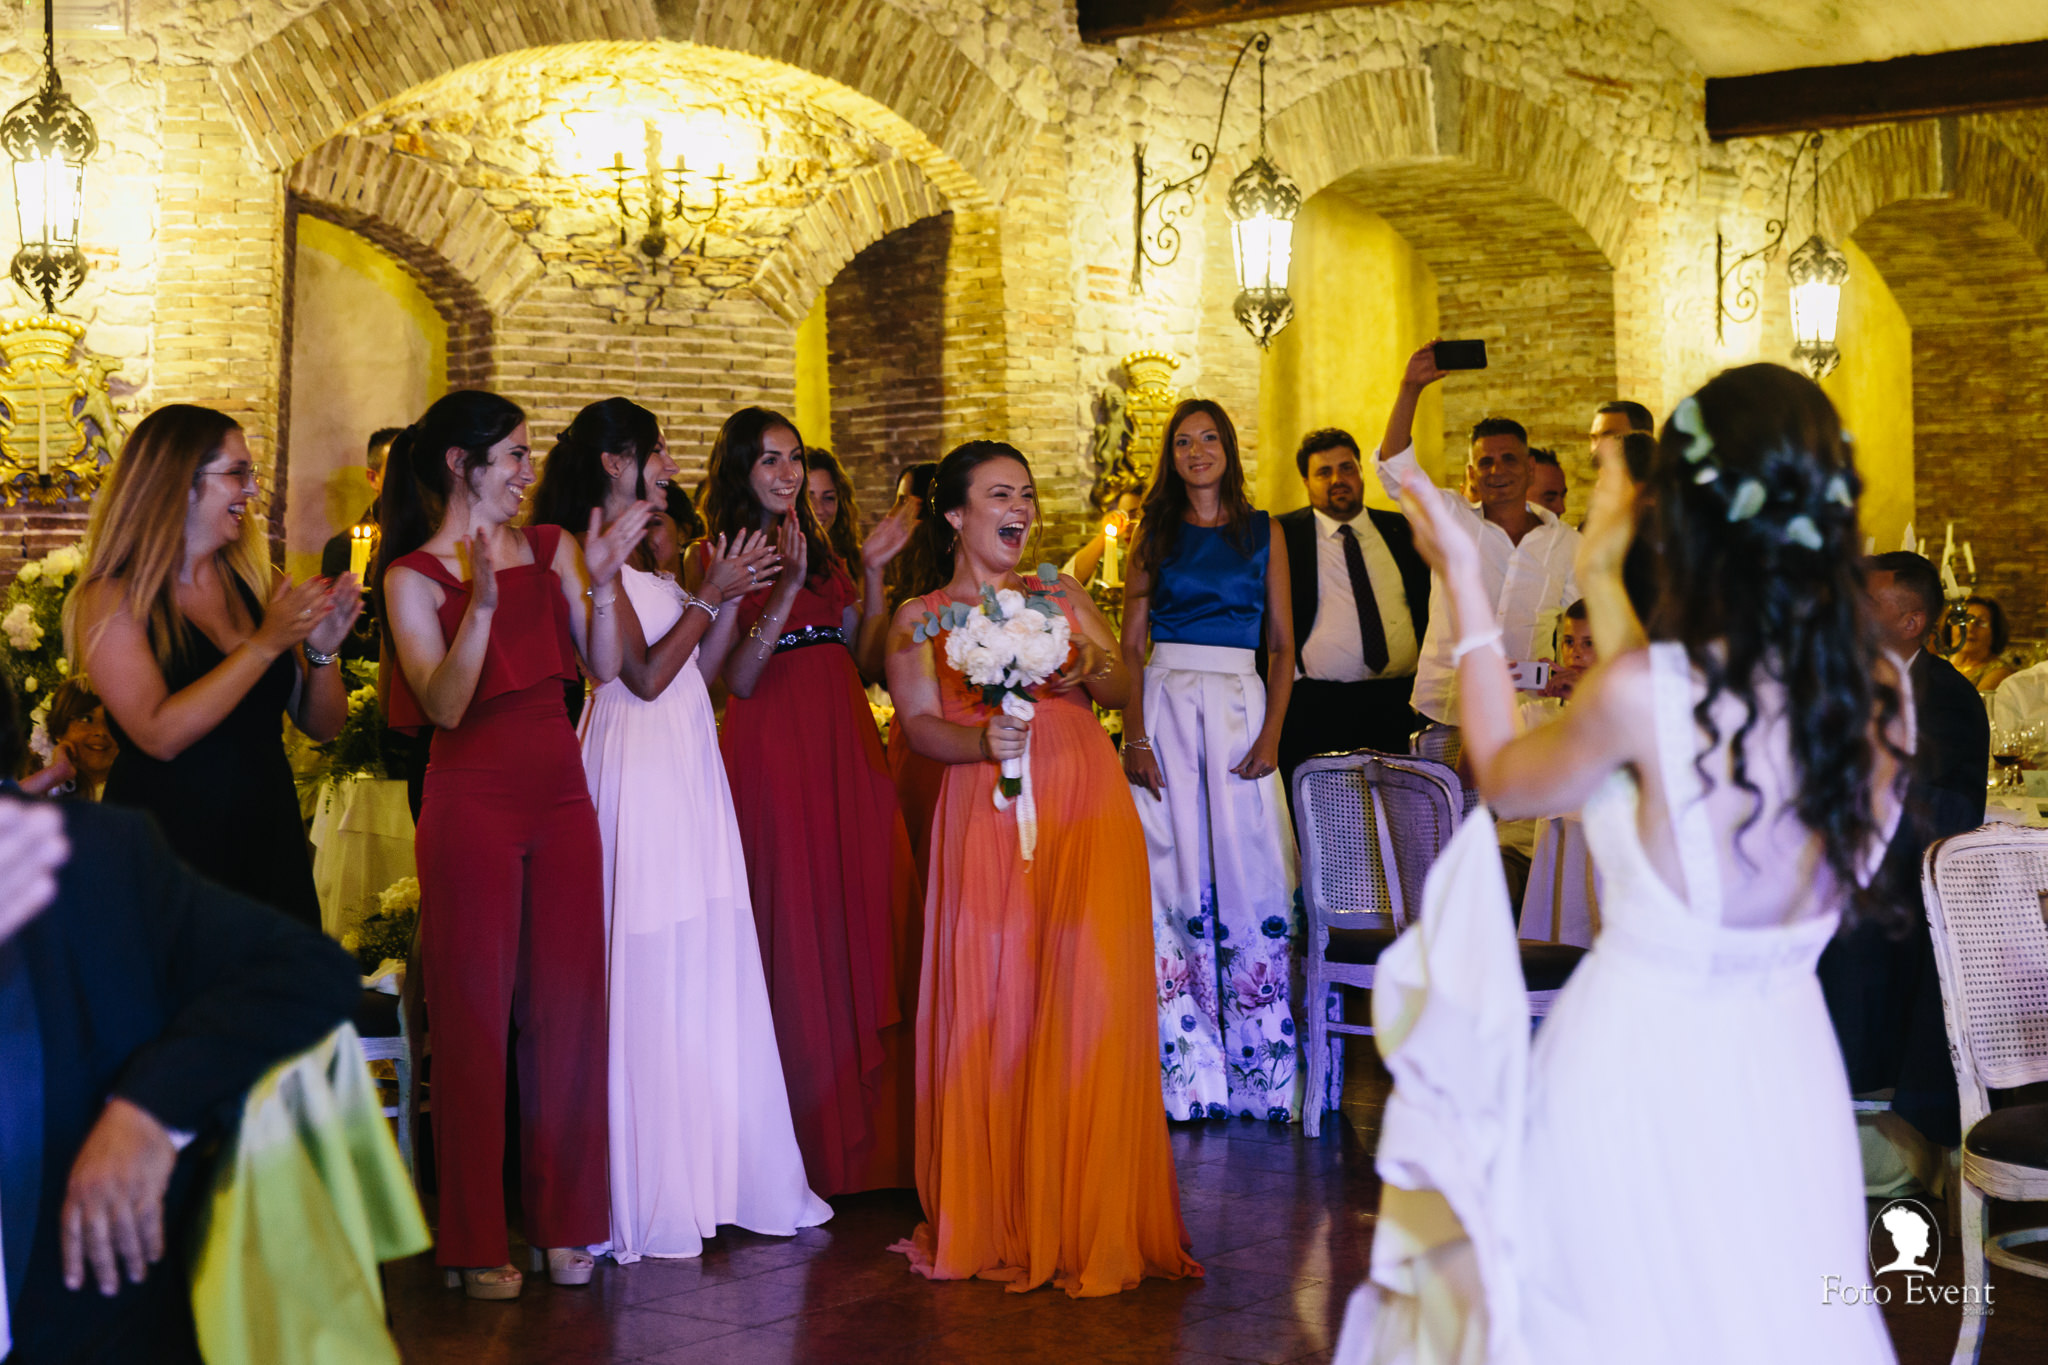 046-2019-08-23-Matrimonio-Lucia-e-Rosario-Scopelliti-5DE-2473